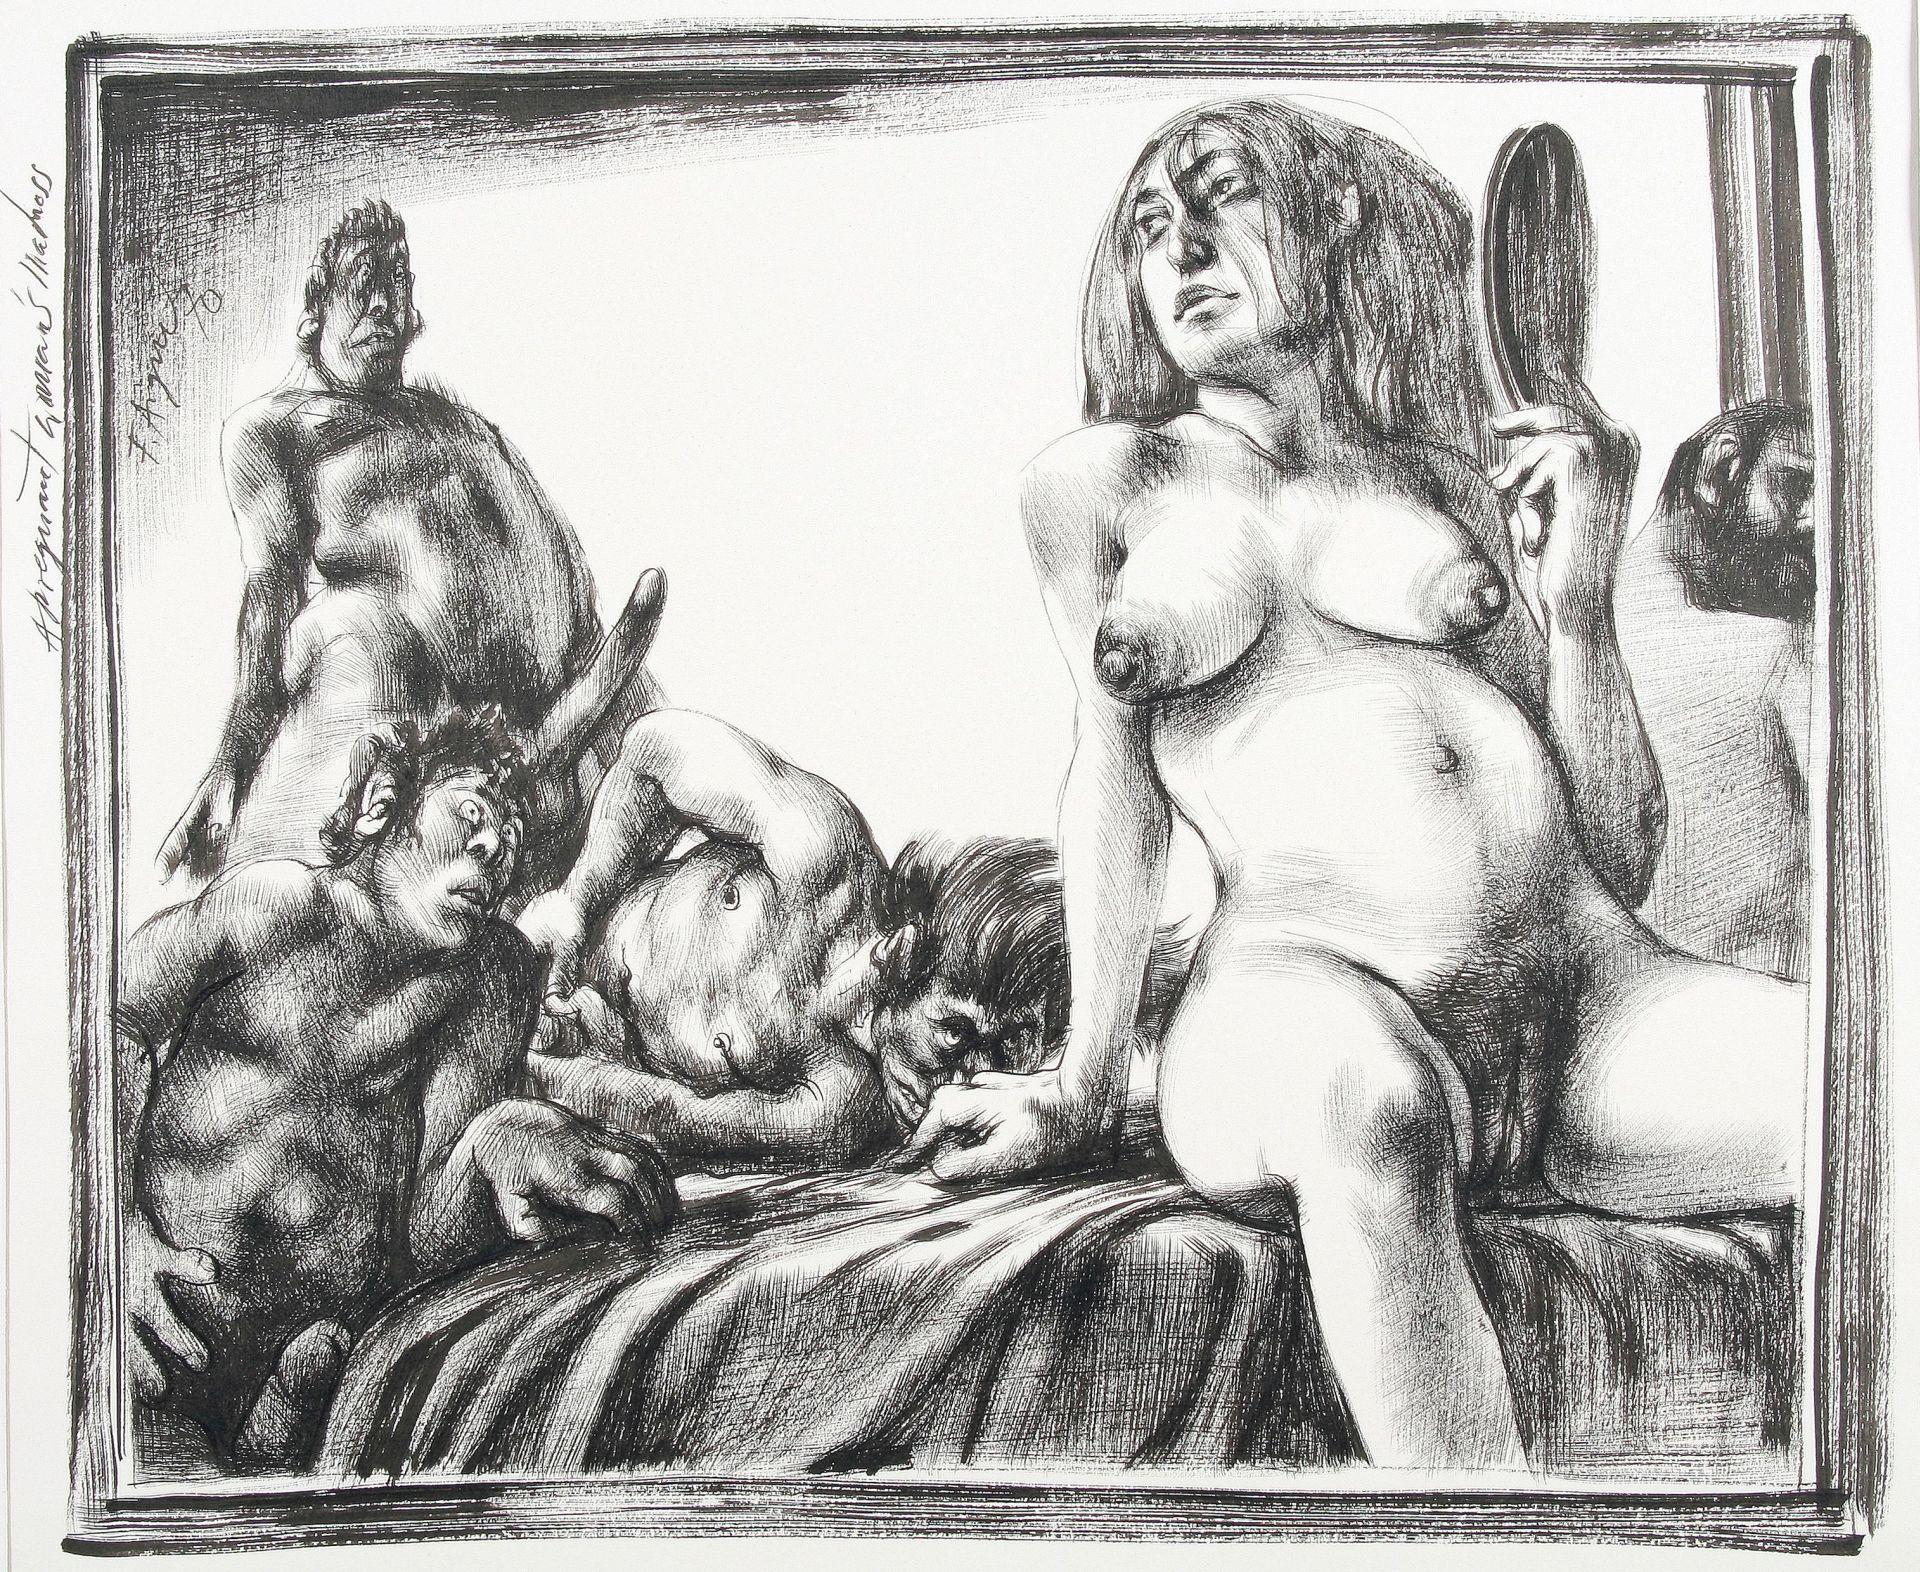 Fritz Aigner-A pregnant woman's madness I.